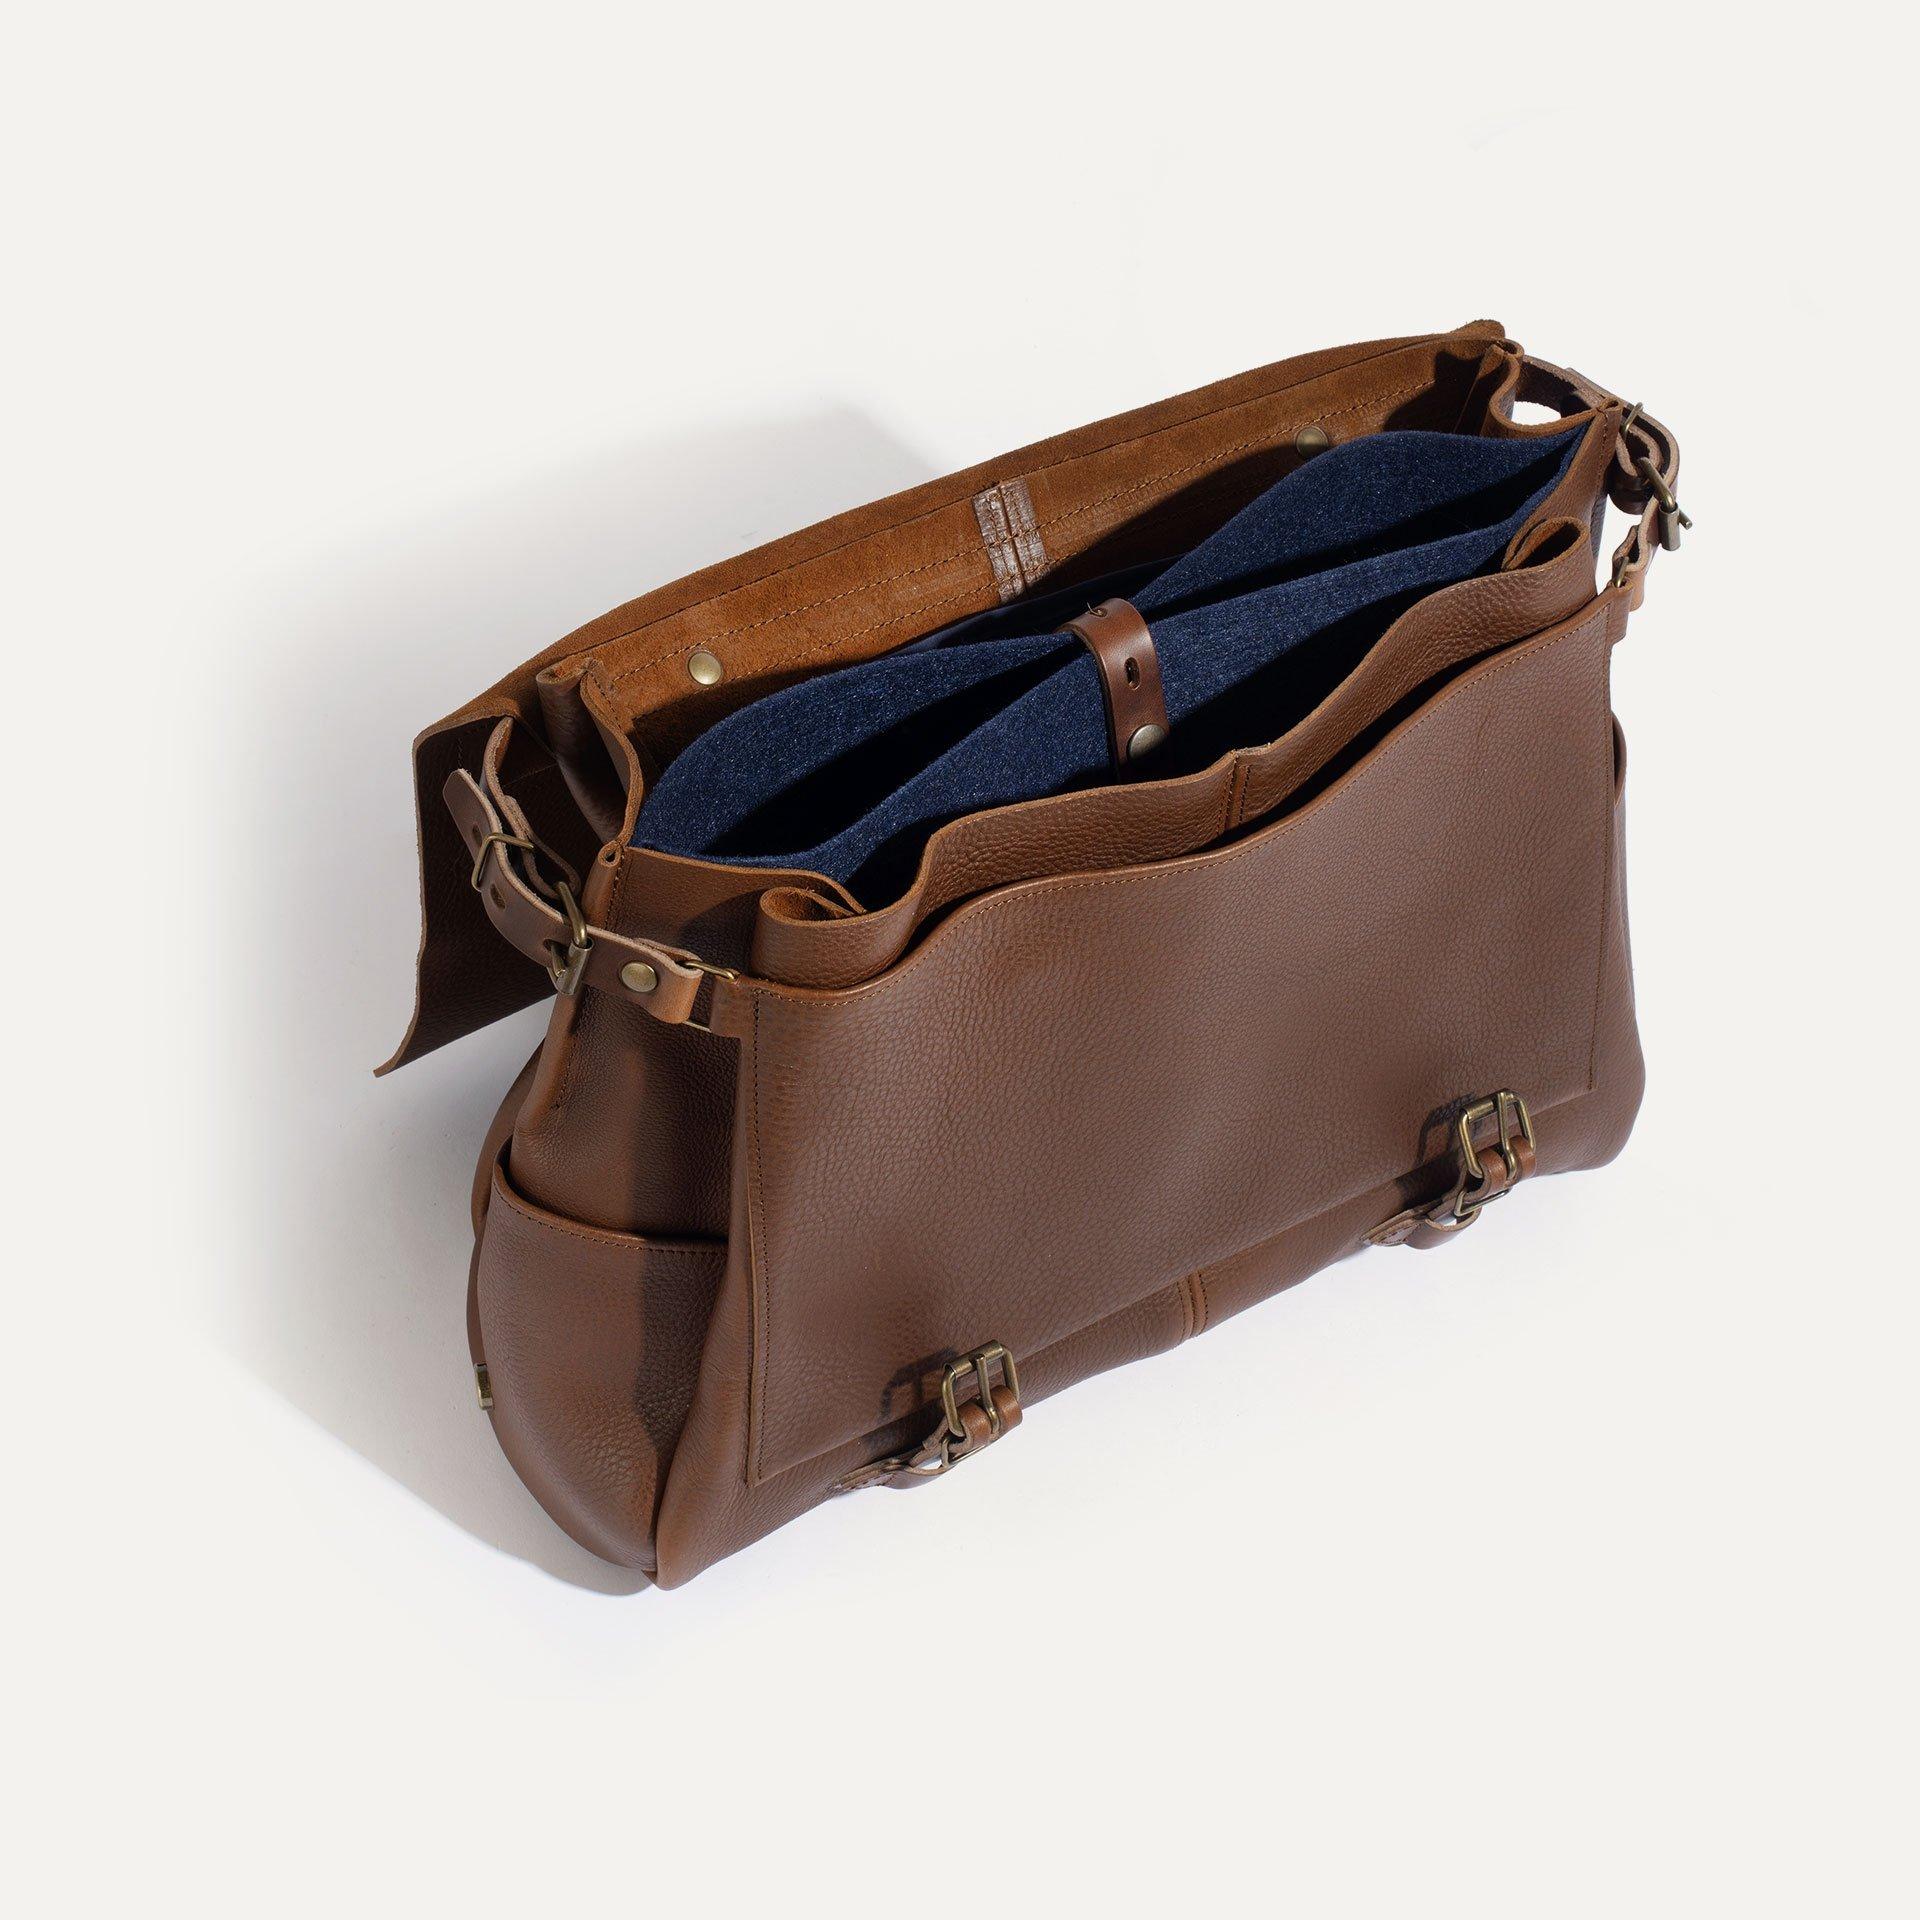 Executive Postman bag 48h Irving - Cuba Libre (image n°4)